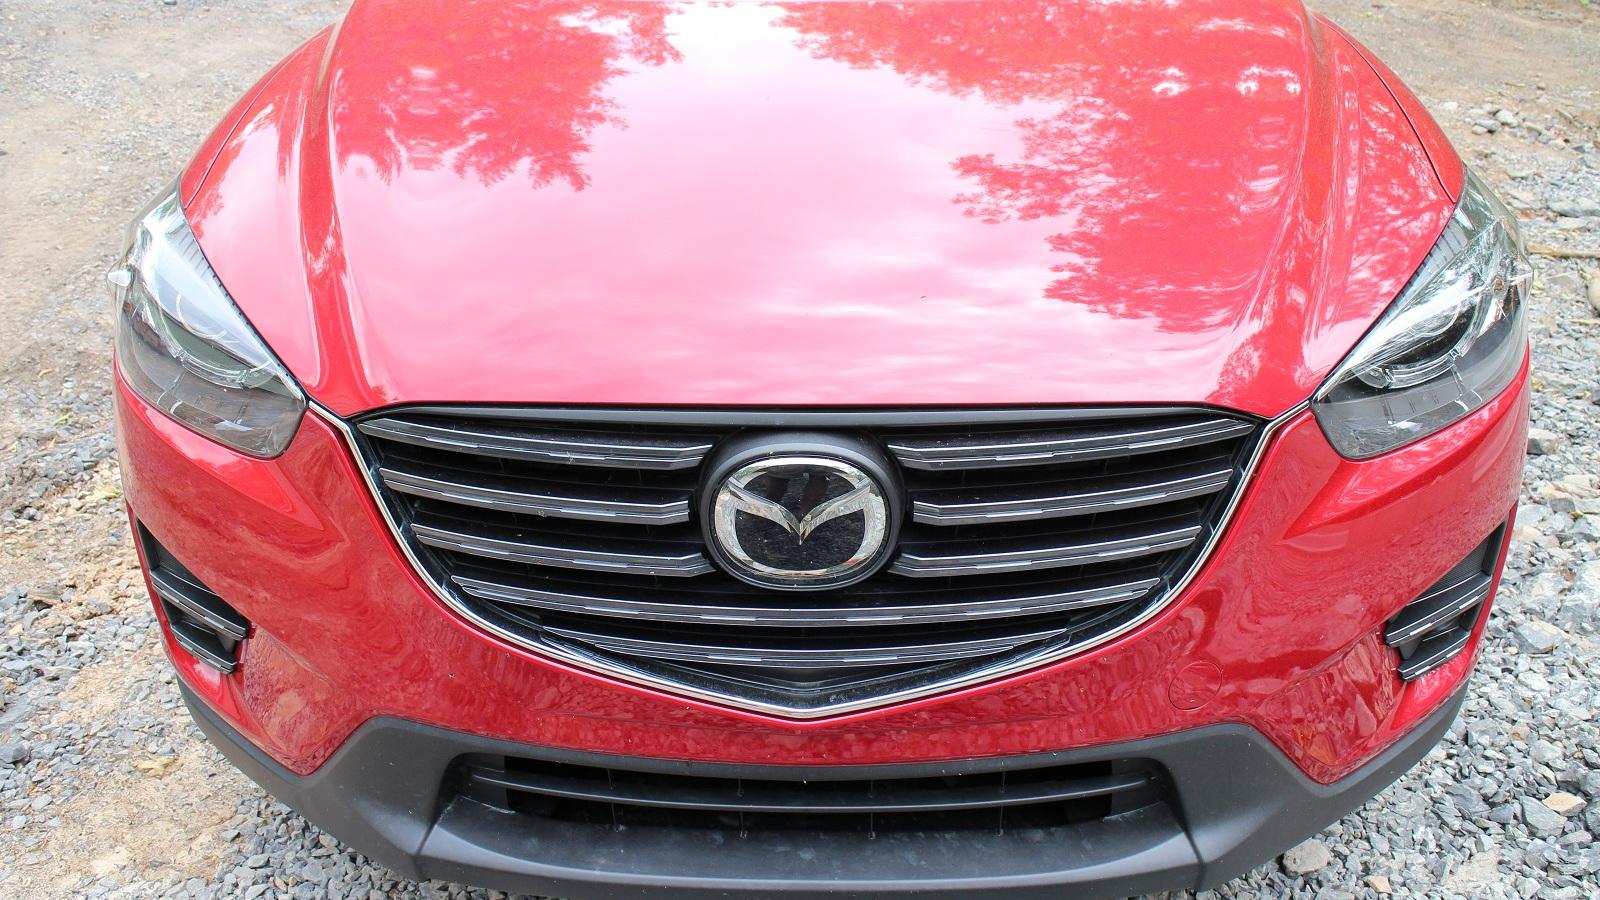 2016 Mazda CX-5 Grand Touring AWD, Catskill Mountains, New York, May 2015